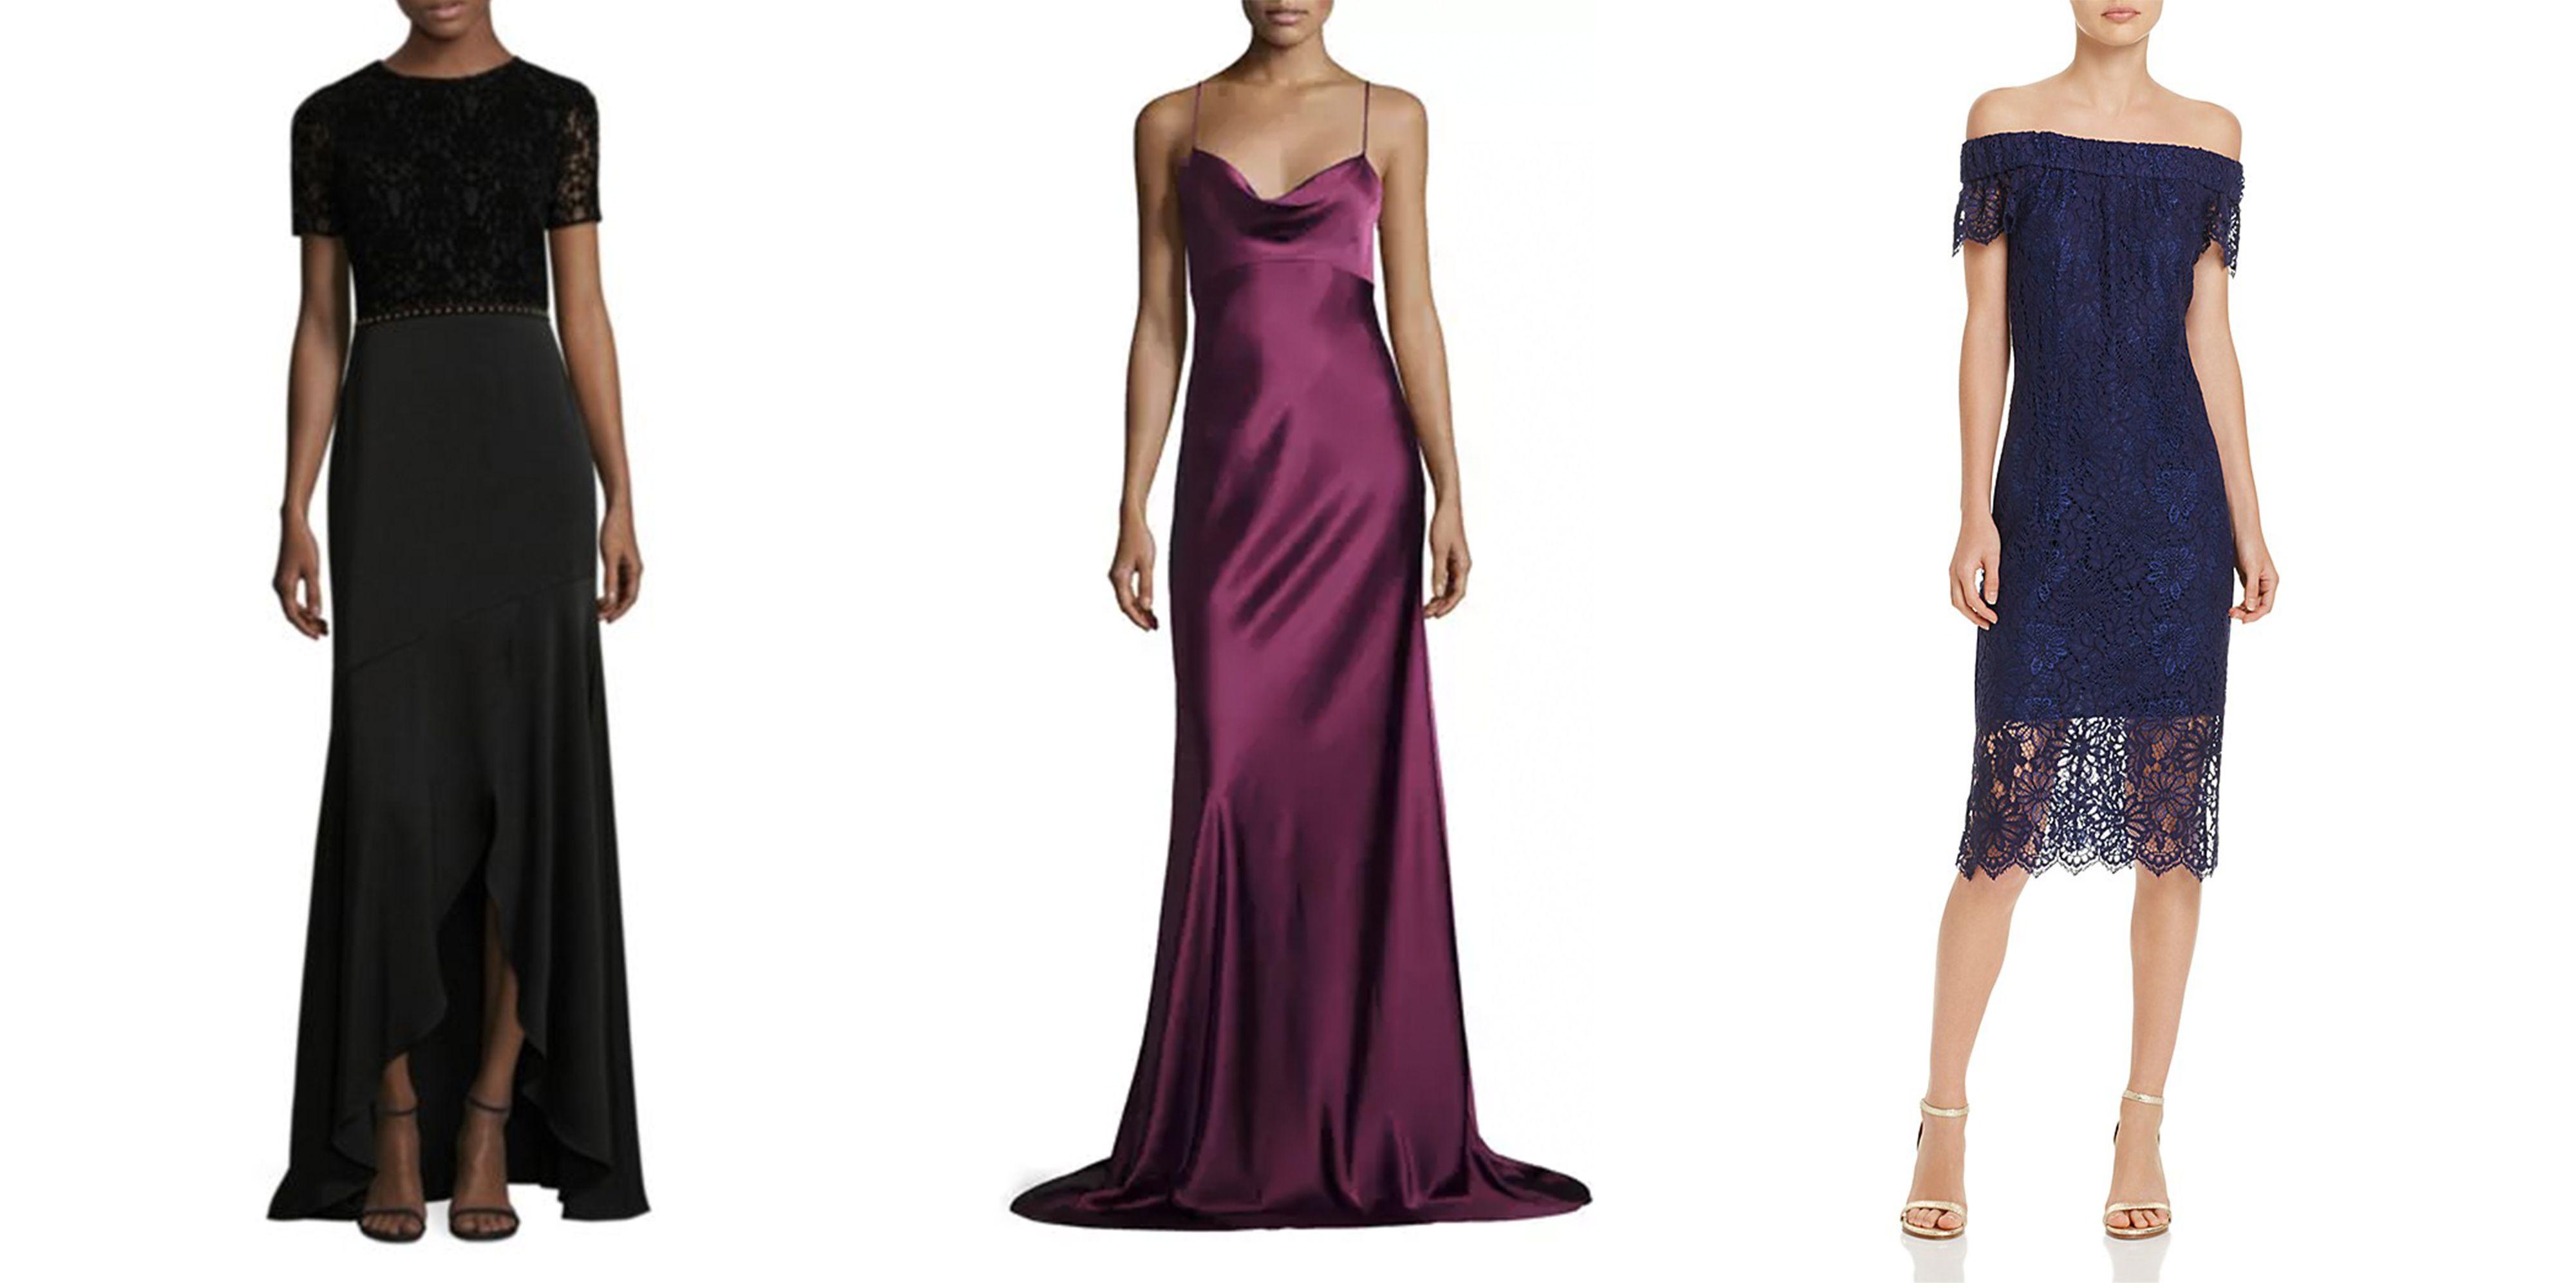 18 Best Winter Wedding Guest Dresses